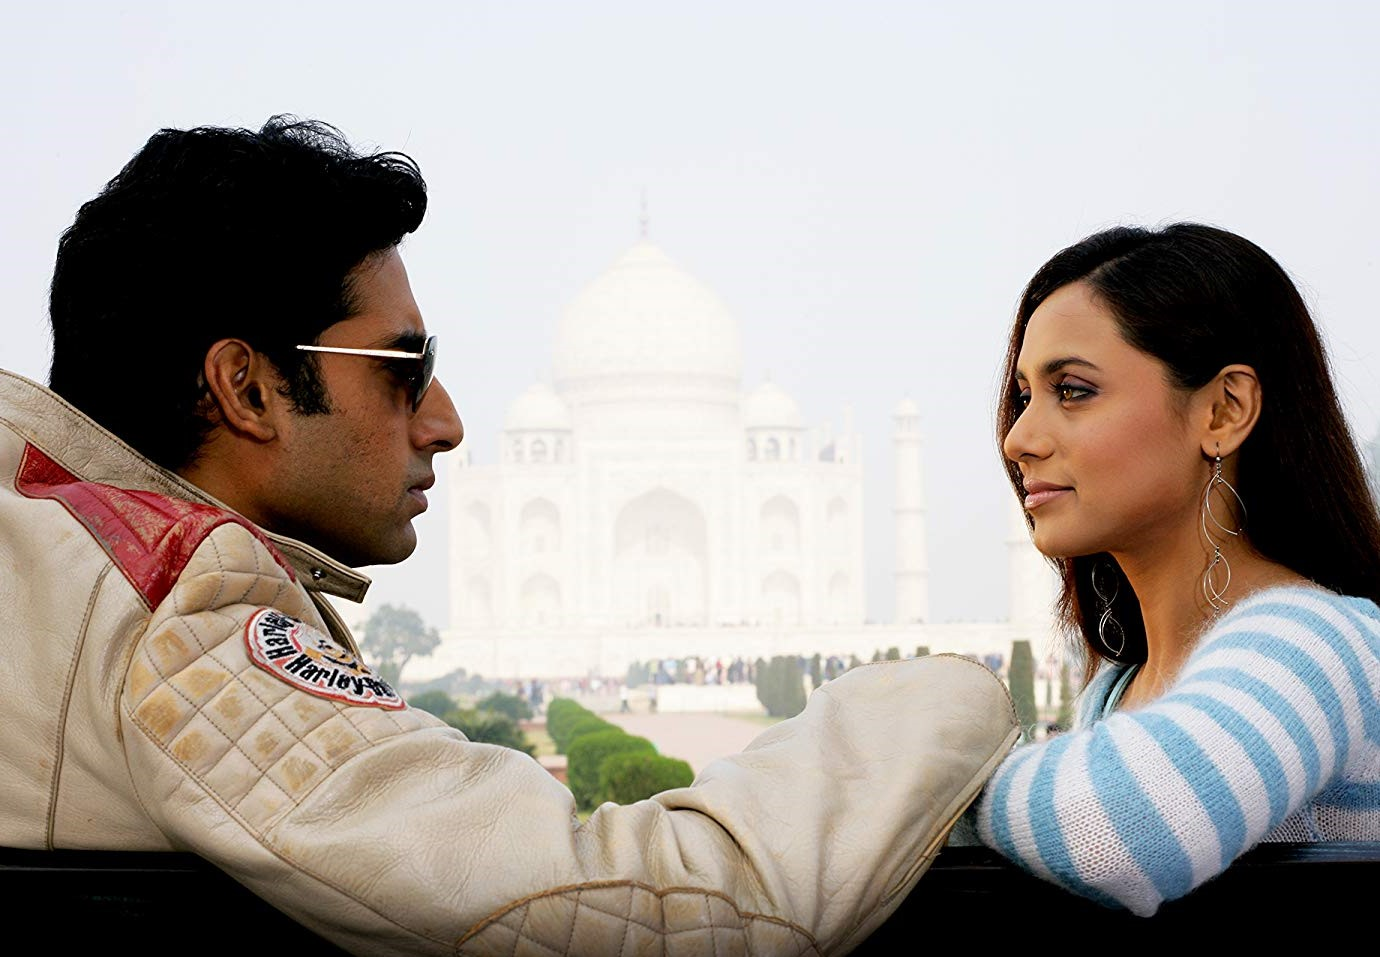 Rani Mukerji, Abhishek Bachchan-Starrer Bunty Aur Babli to Return With a Reboot!